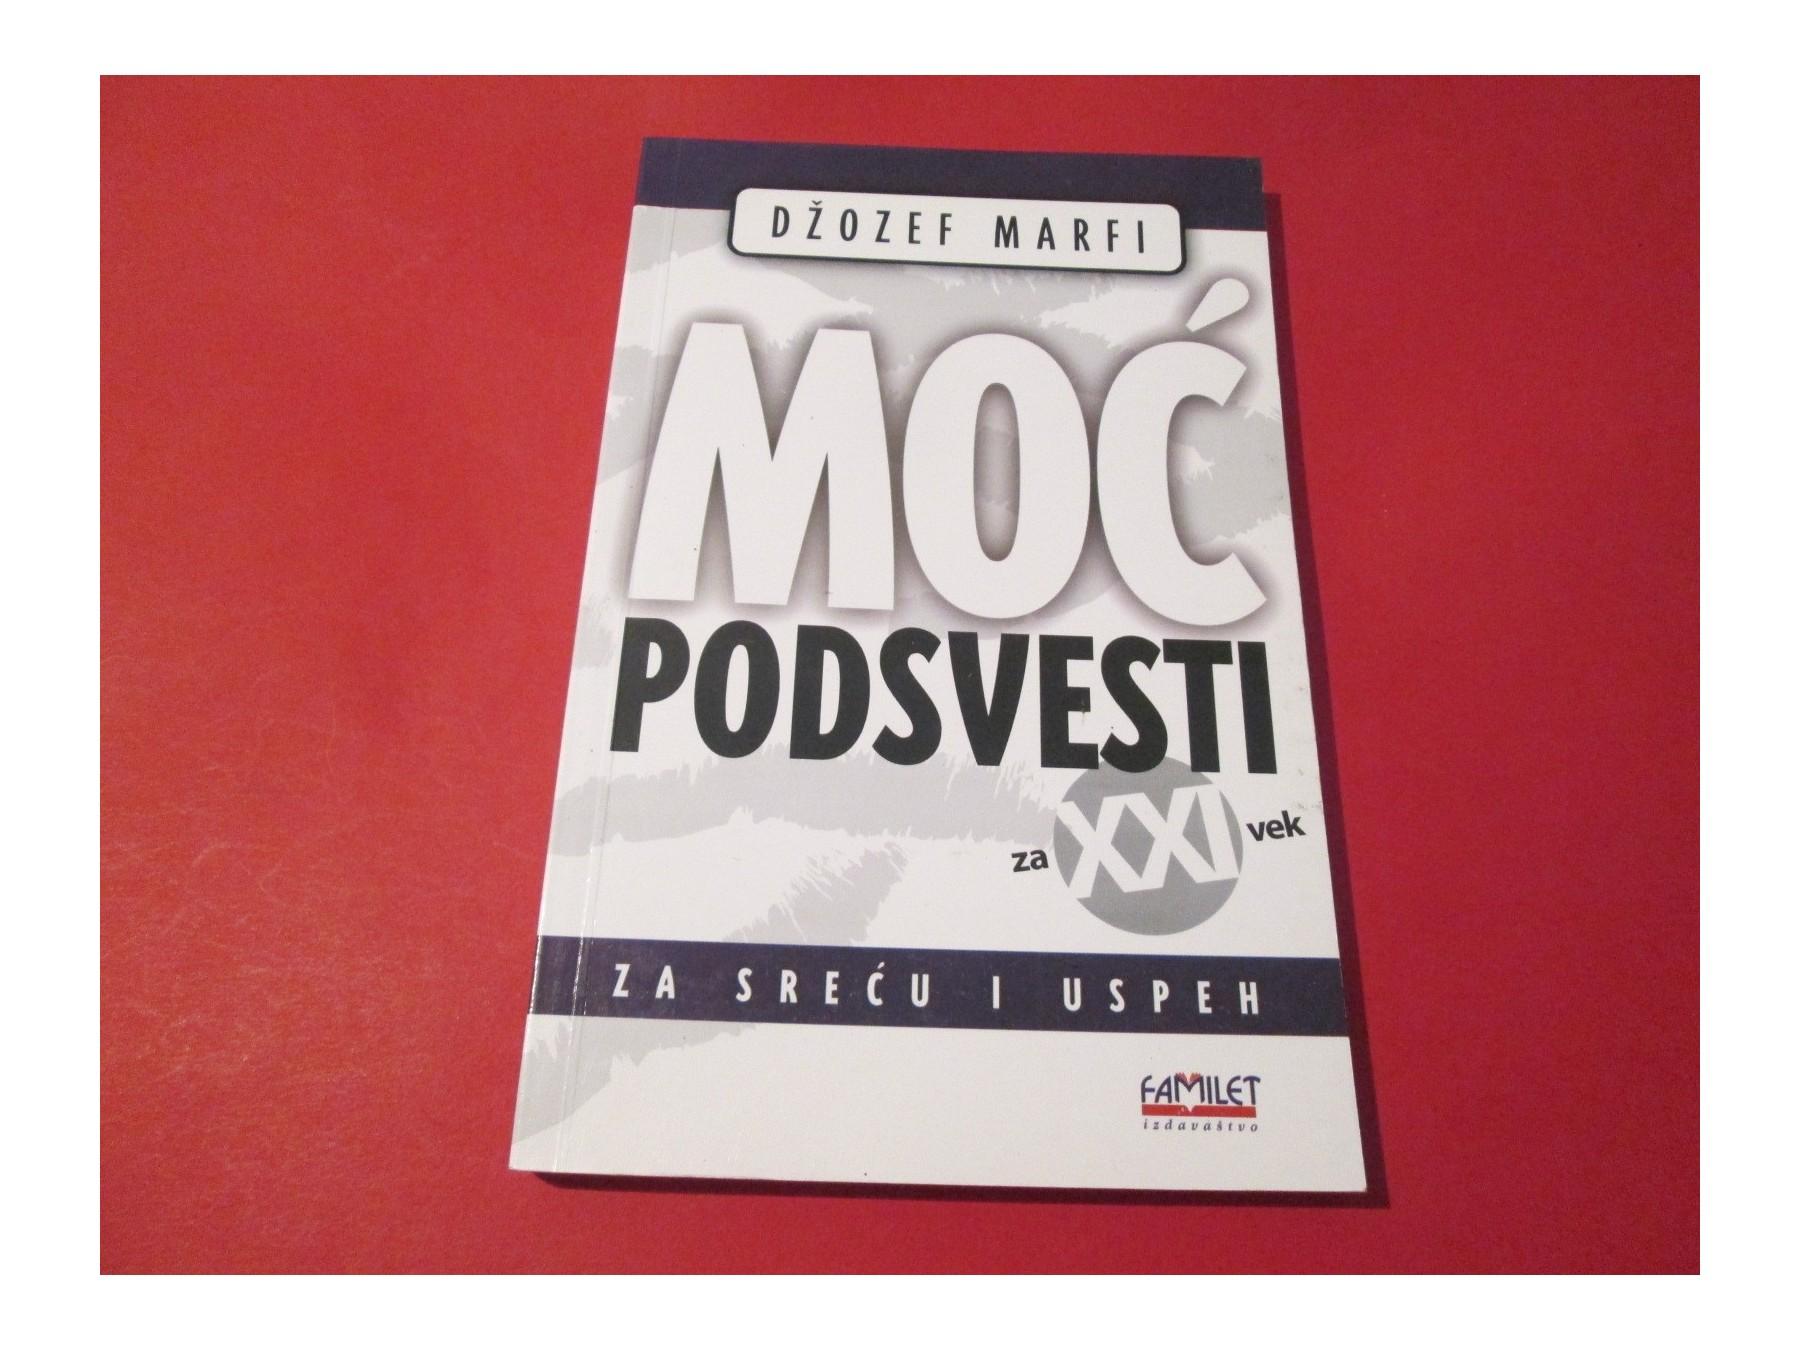 Dzozef moc ebook download marfi podsvesti